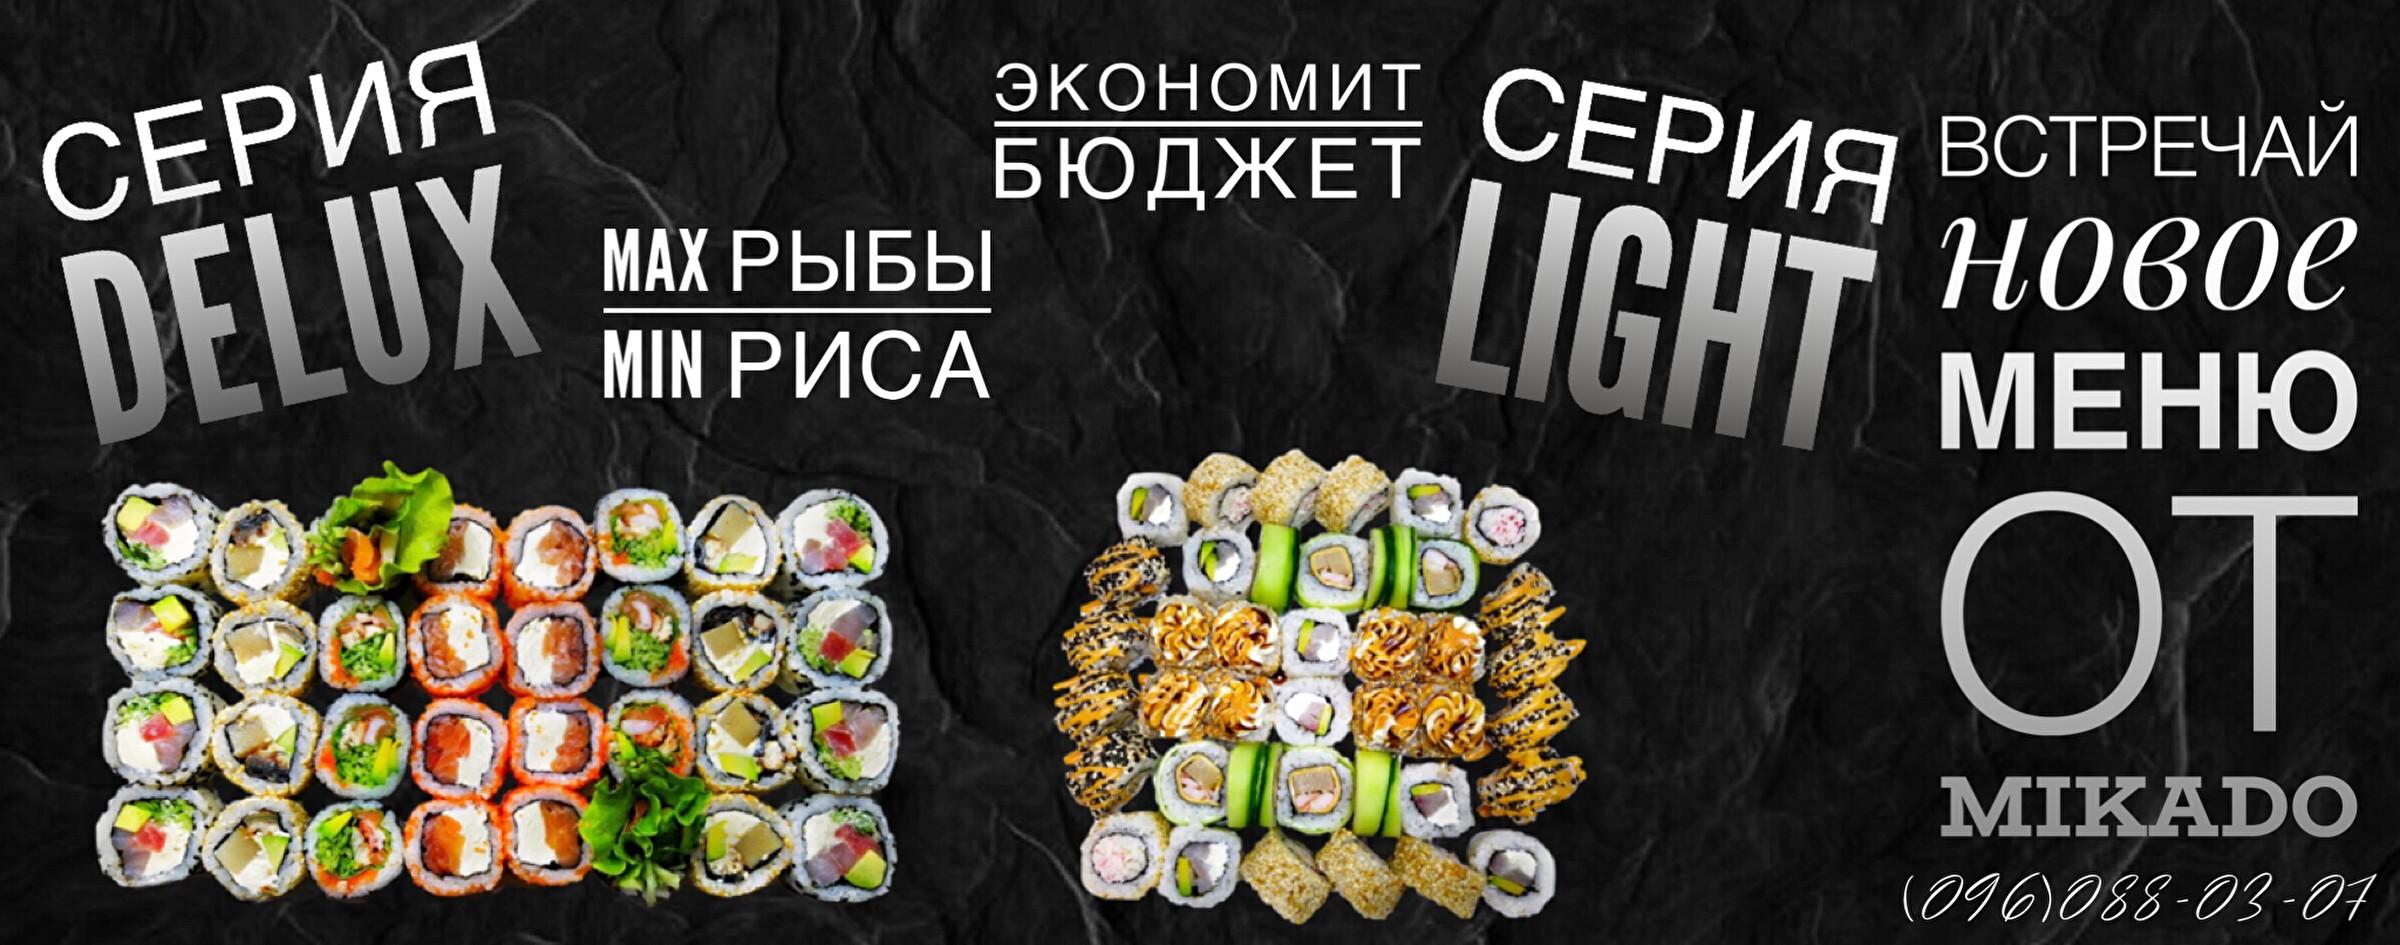 Встречай новинки! Серия DELUX, серия LIGHT